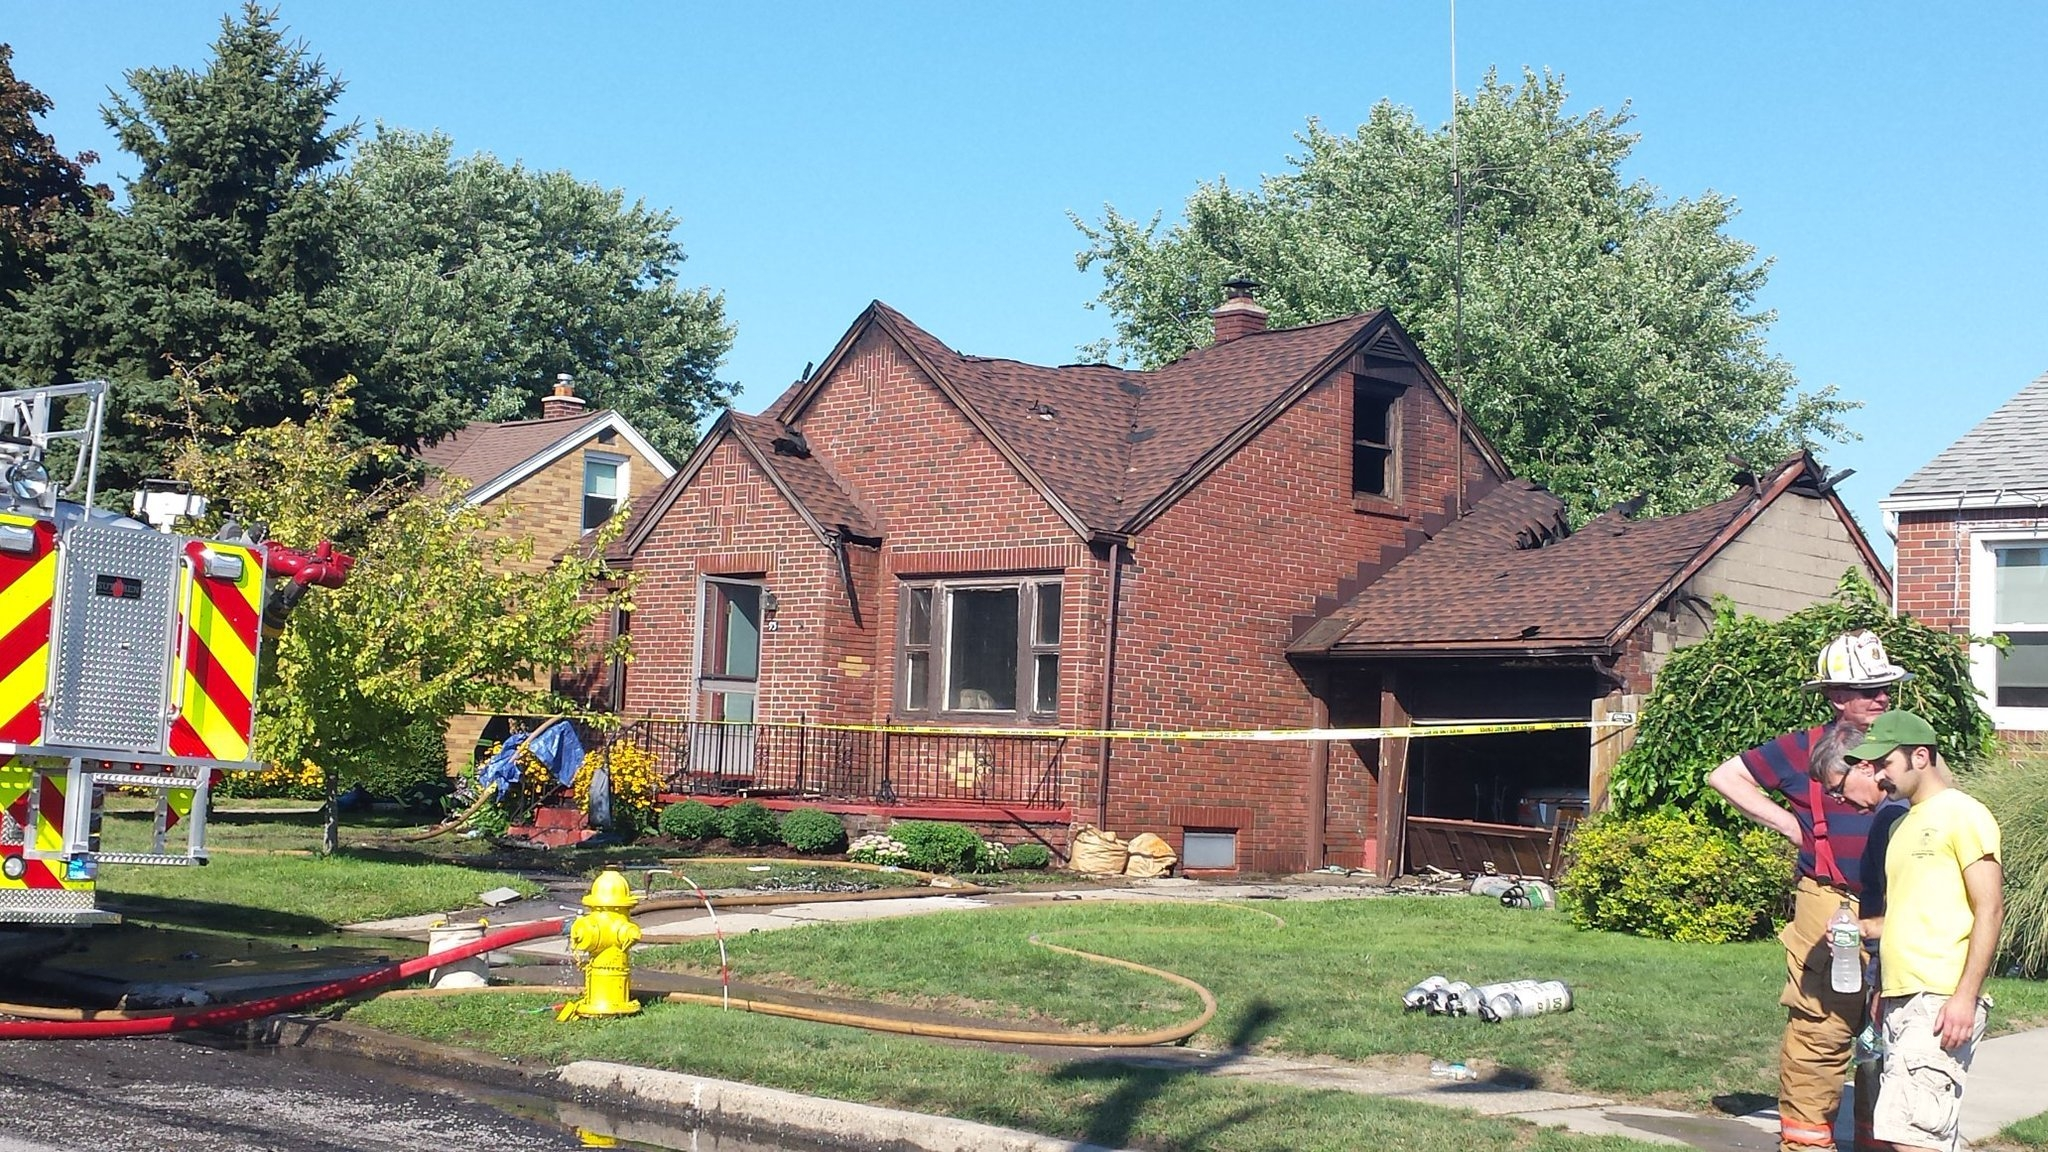 Firefighters rope off the burned home on Peoria Avenue in Cheektowaga. (Jonathan Epstein/Buffalo News)